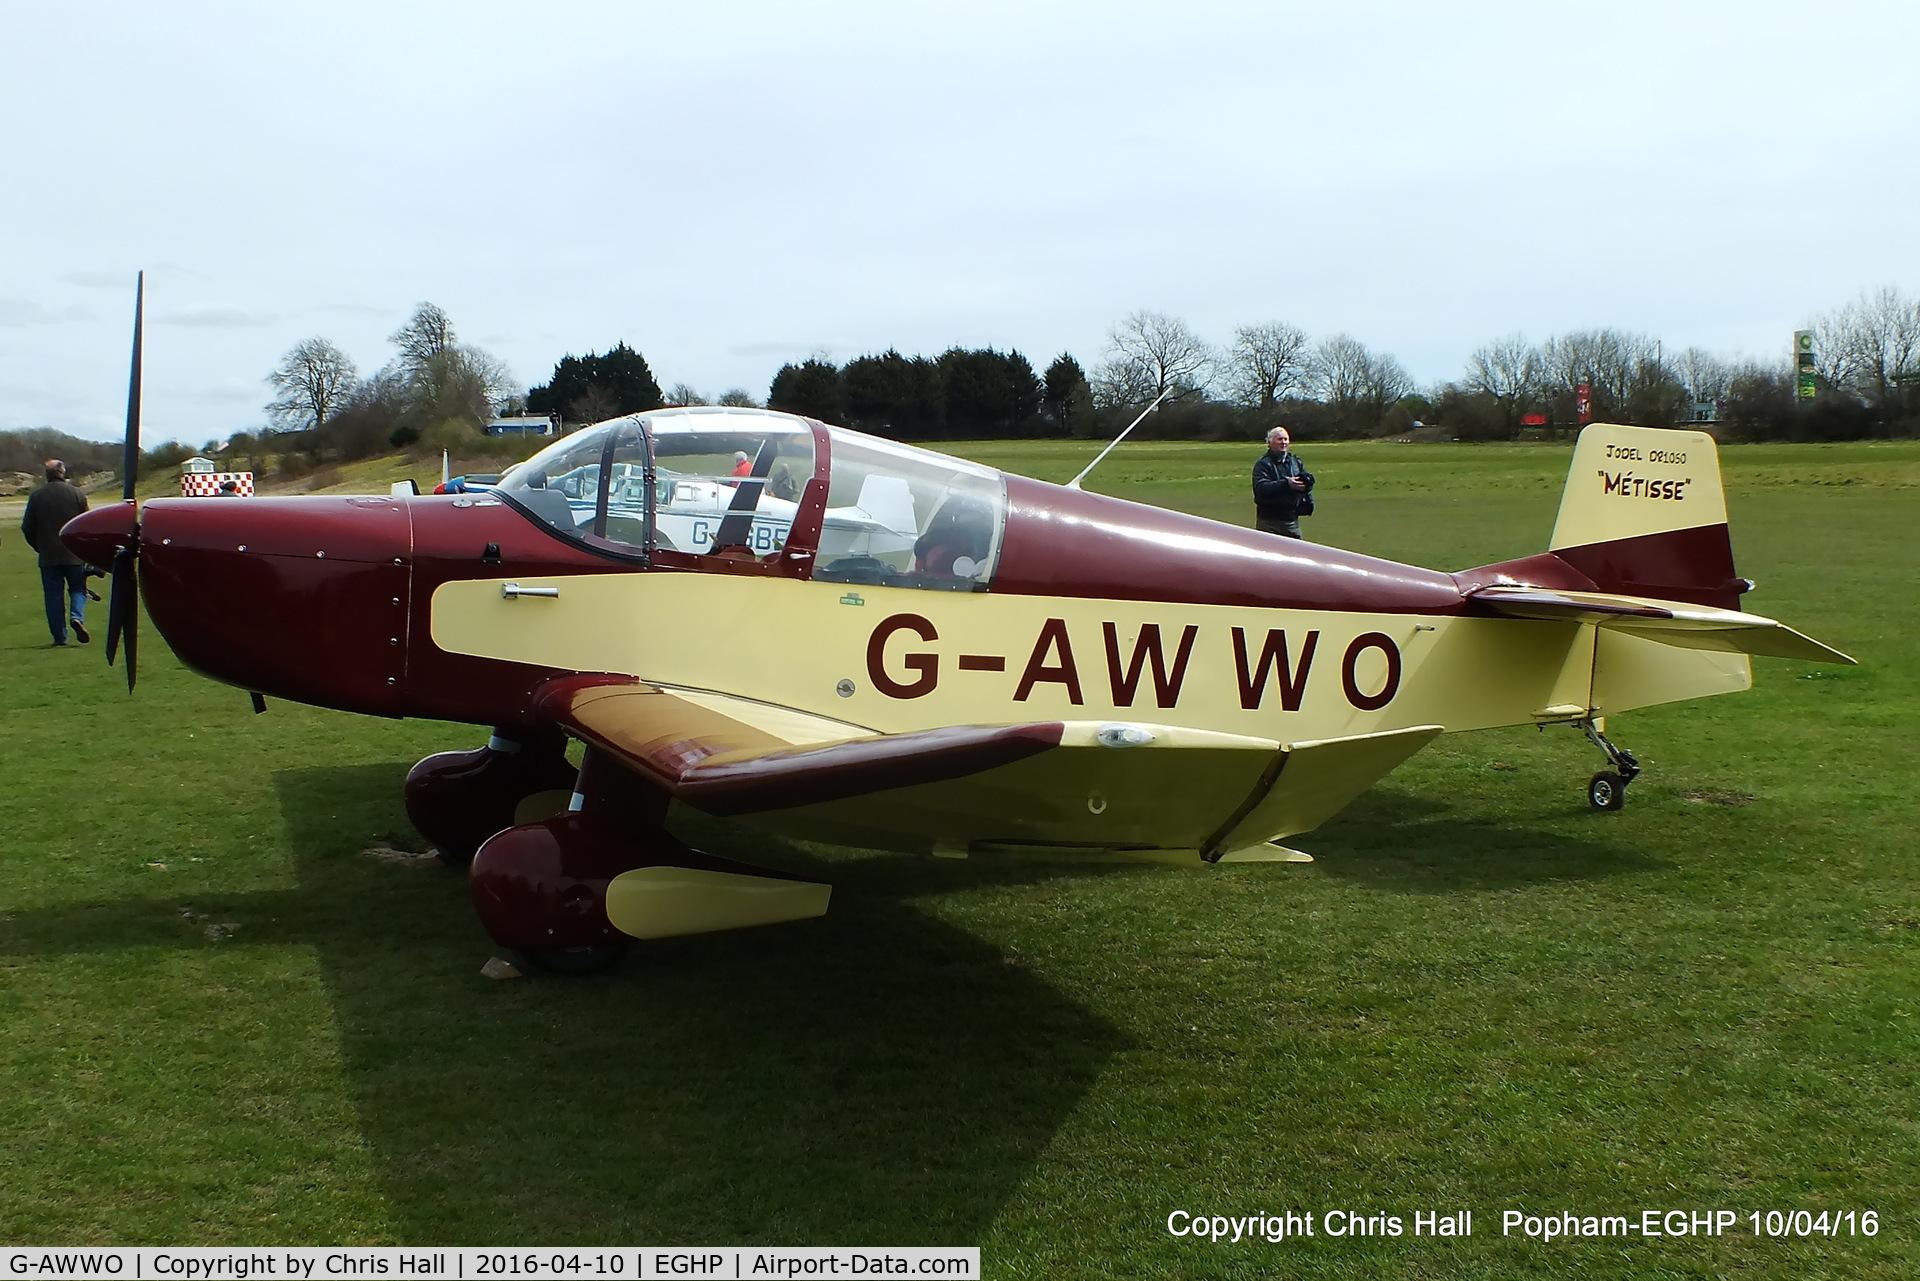 G-AWWO, 1964 CEA Jodel DR-1050 Sicile C/N 552, at the Jodel fly in at Popham